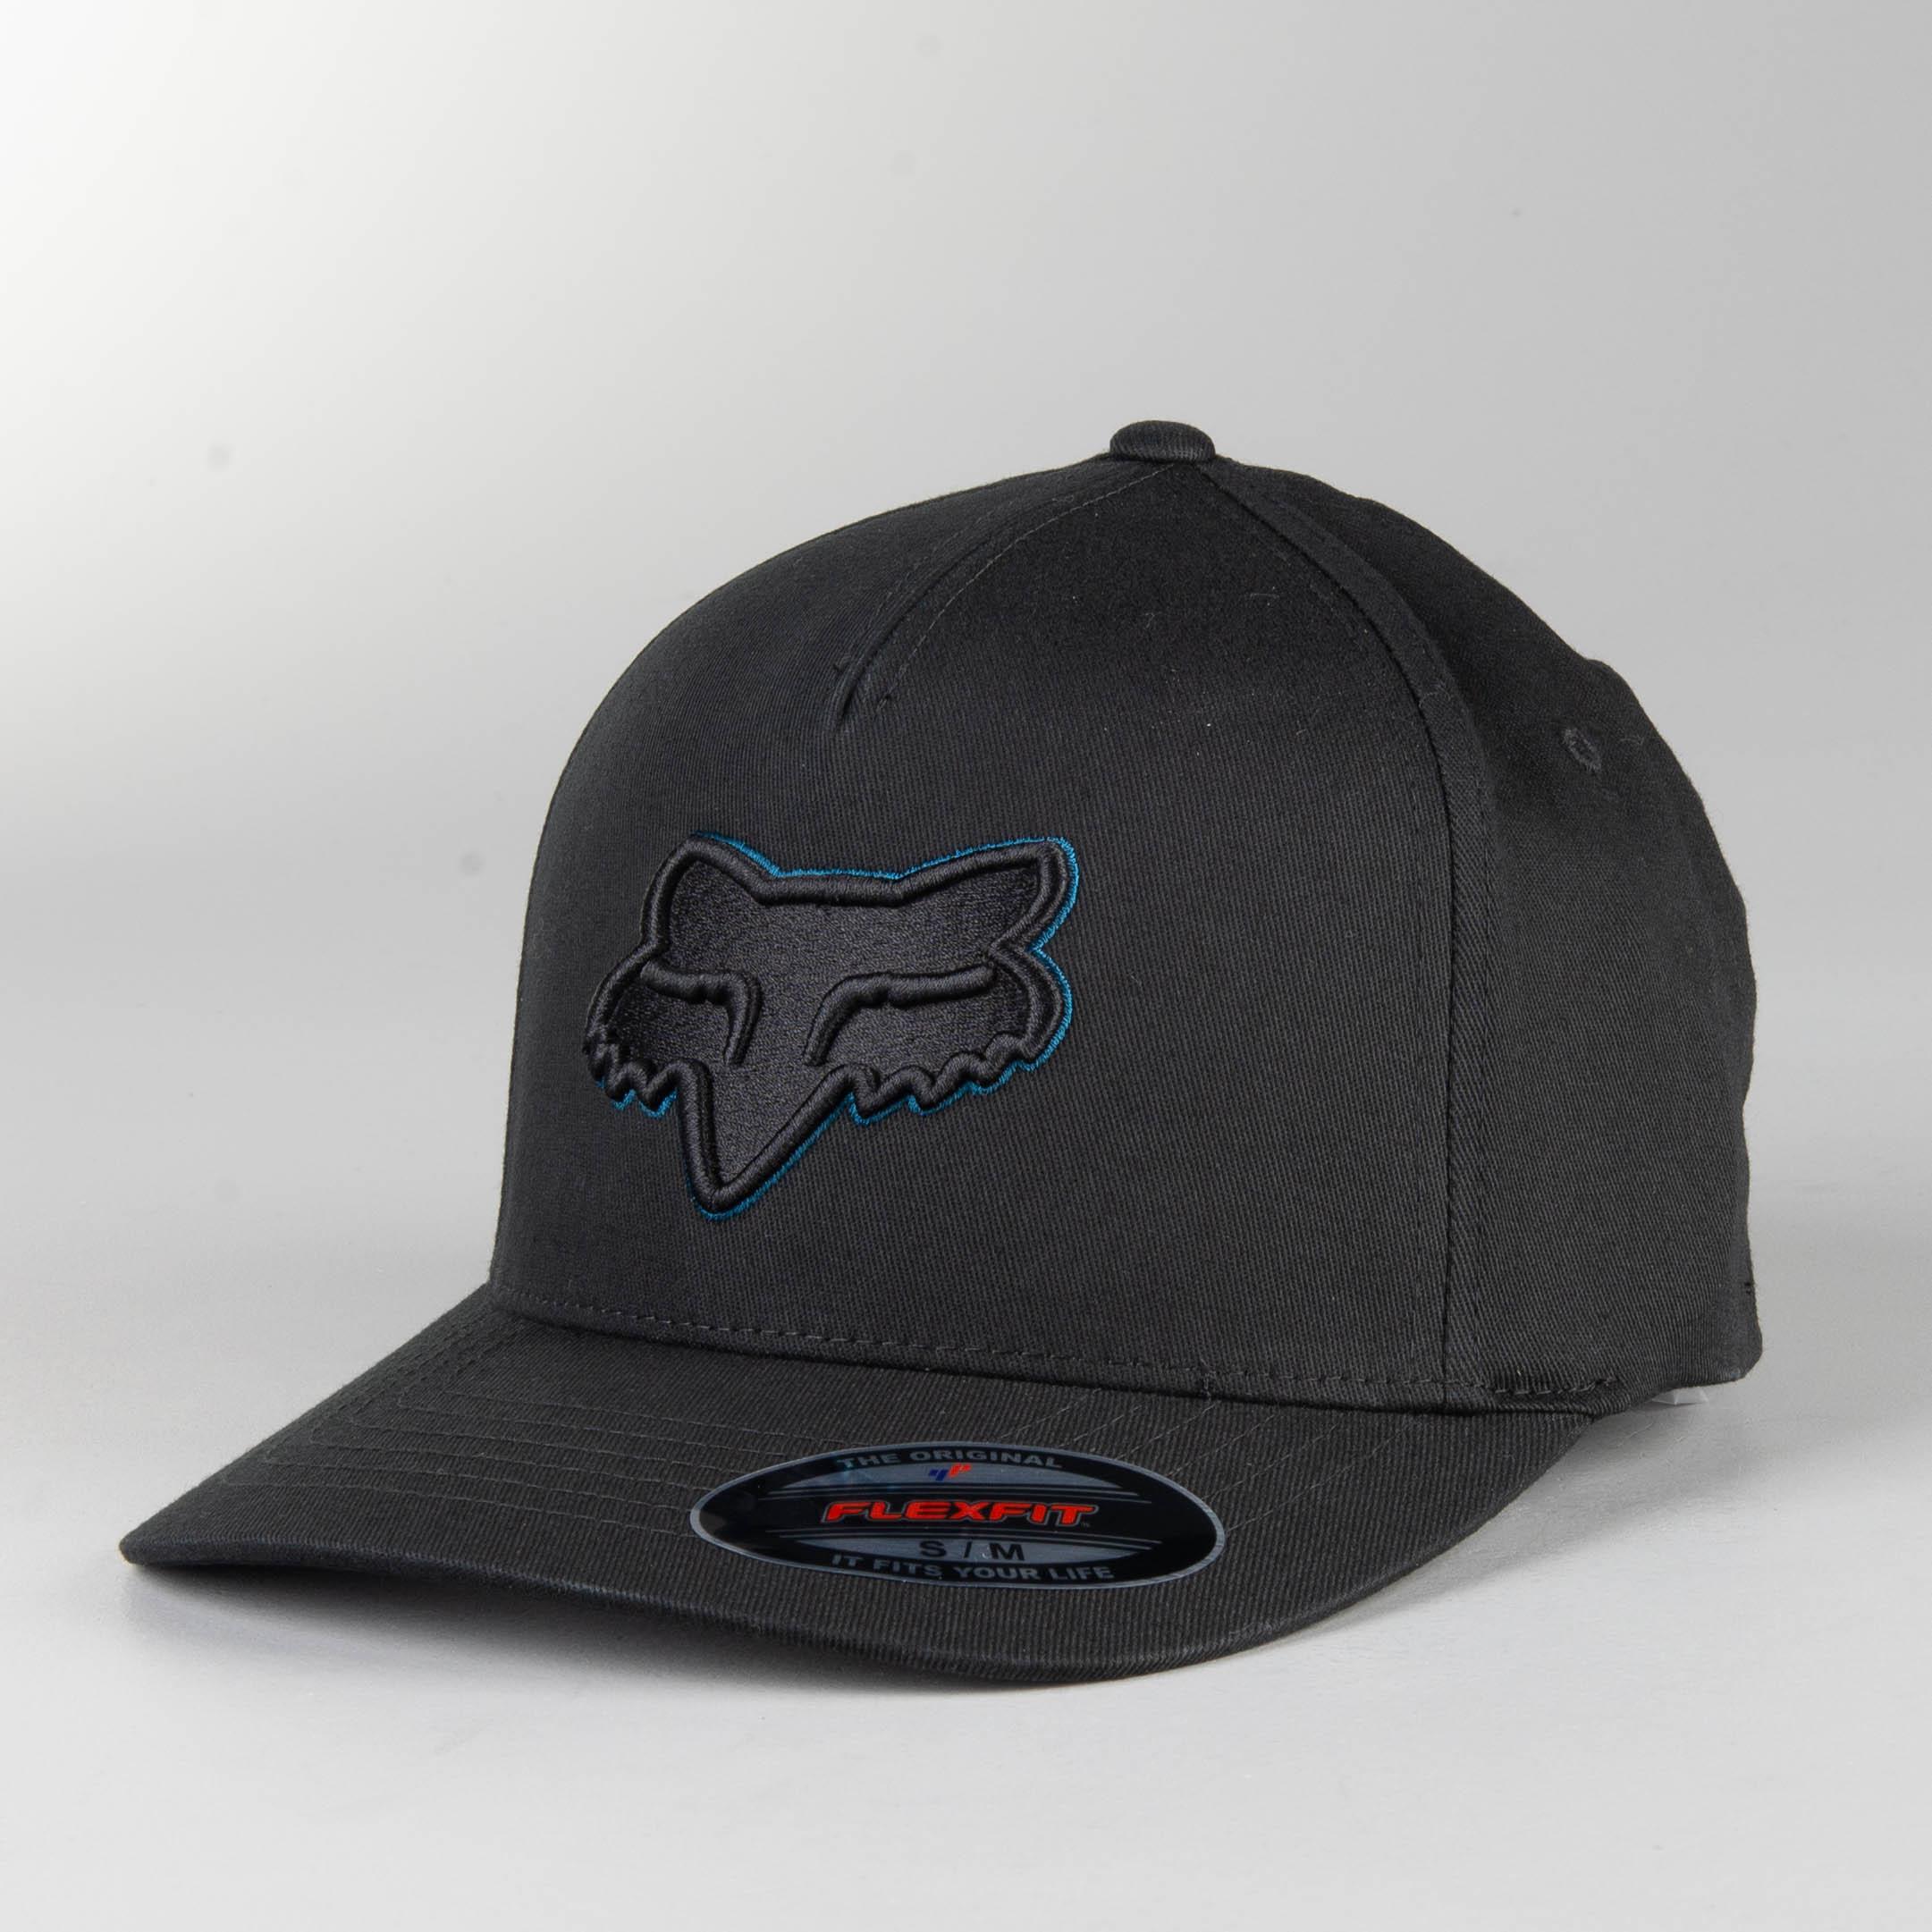 WESTERN STAR FLEXFIT TRUCKER CAP BLACK  WESTERN STAR TRUCKER MESH CAP FLEXFIT